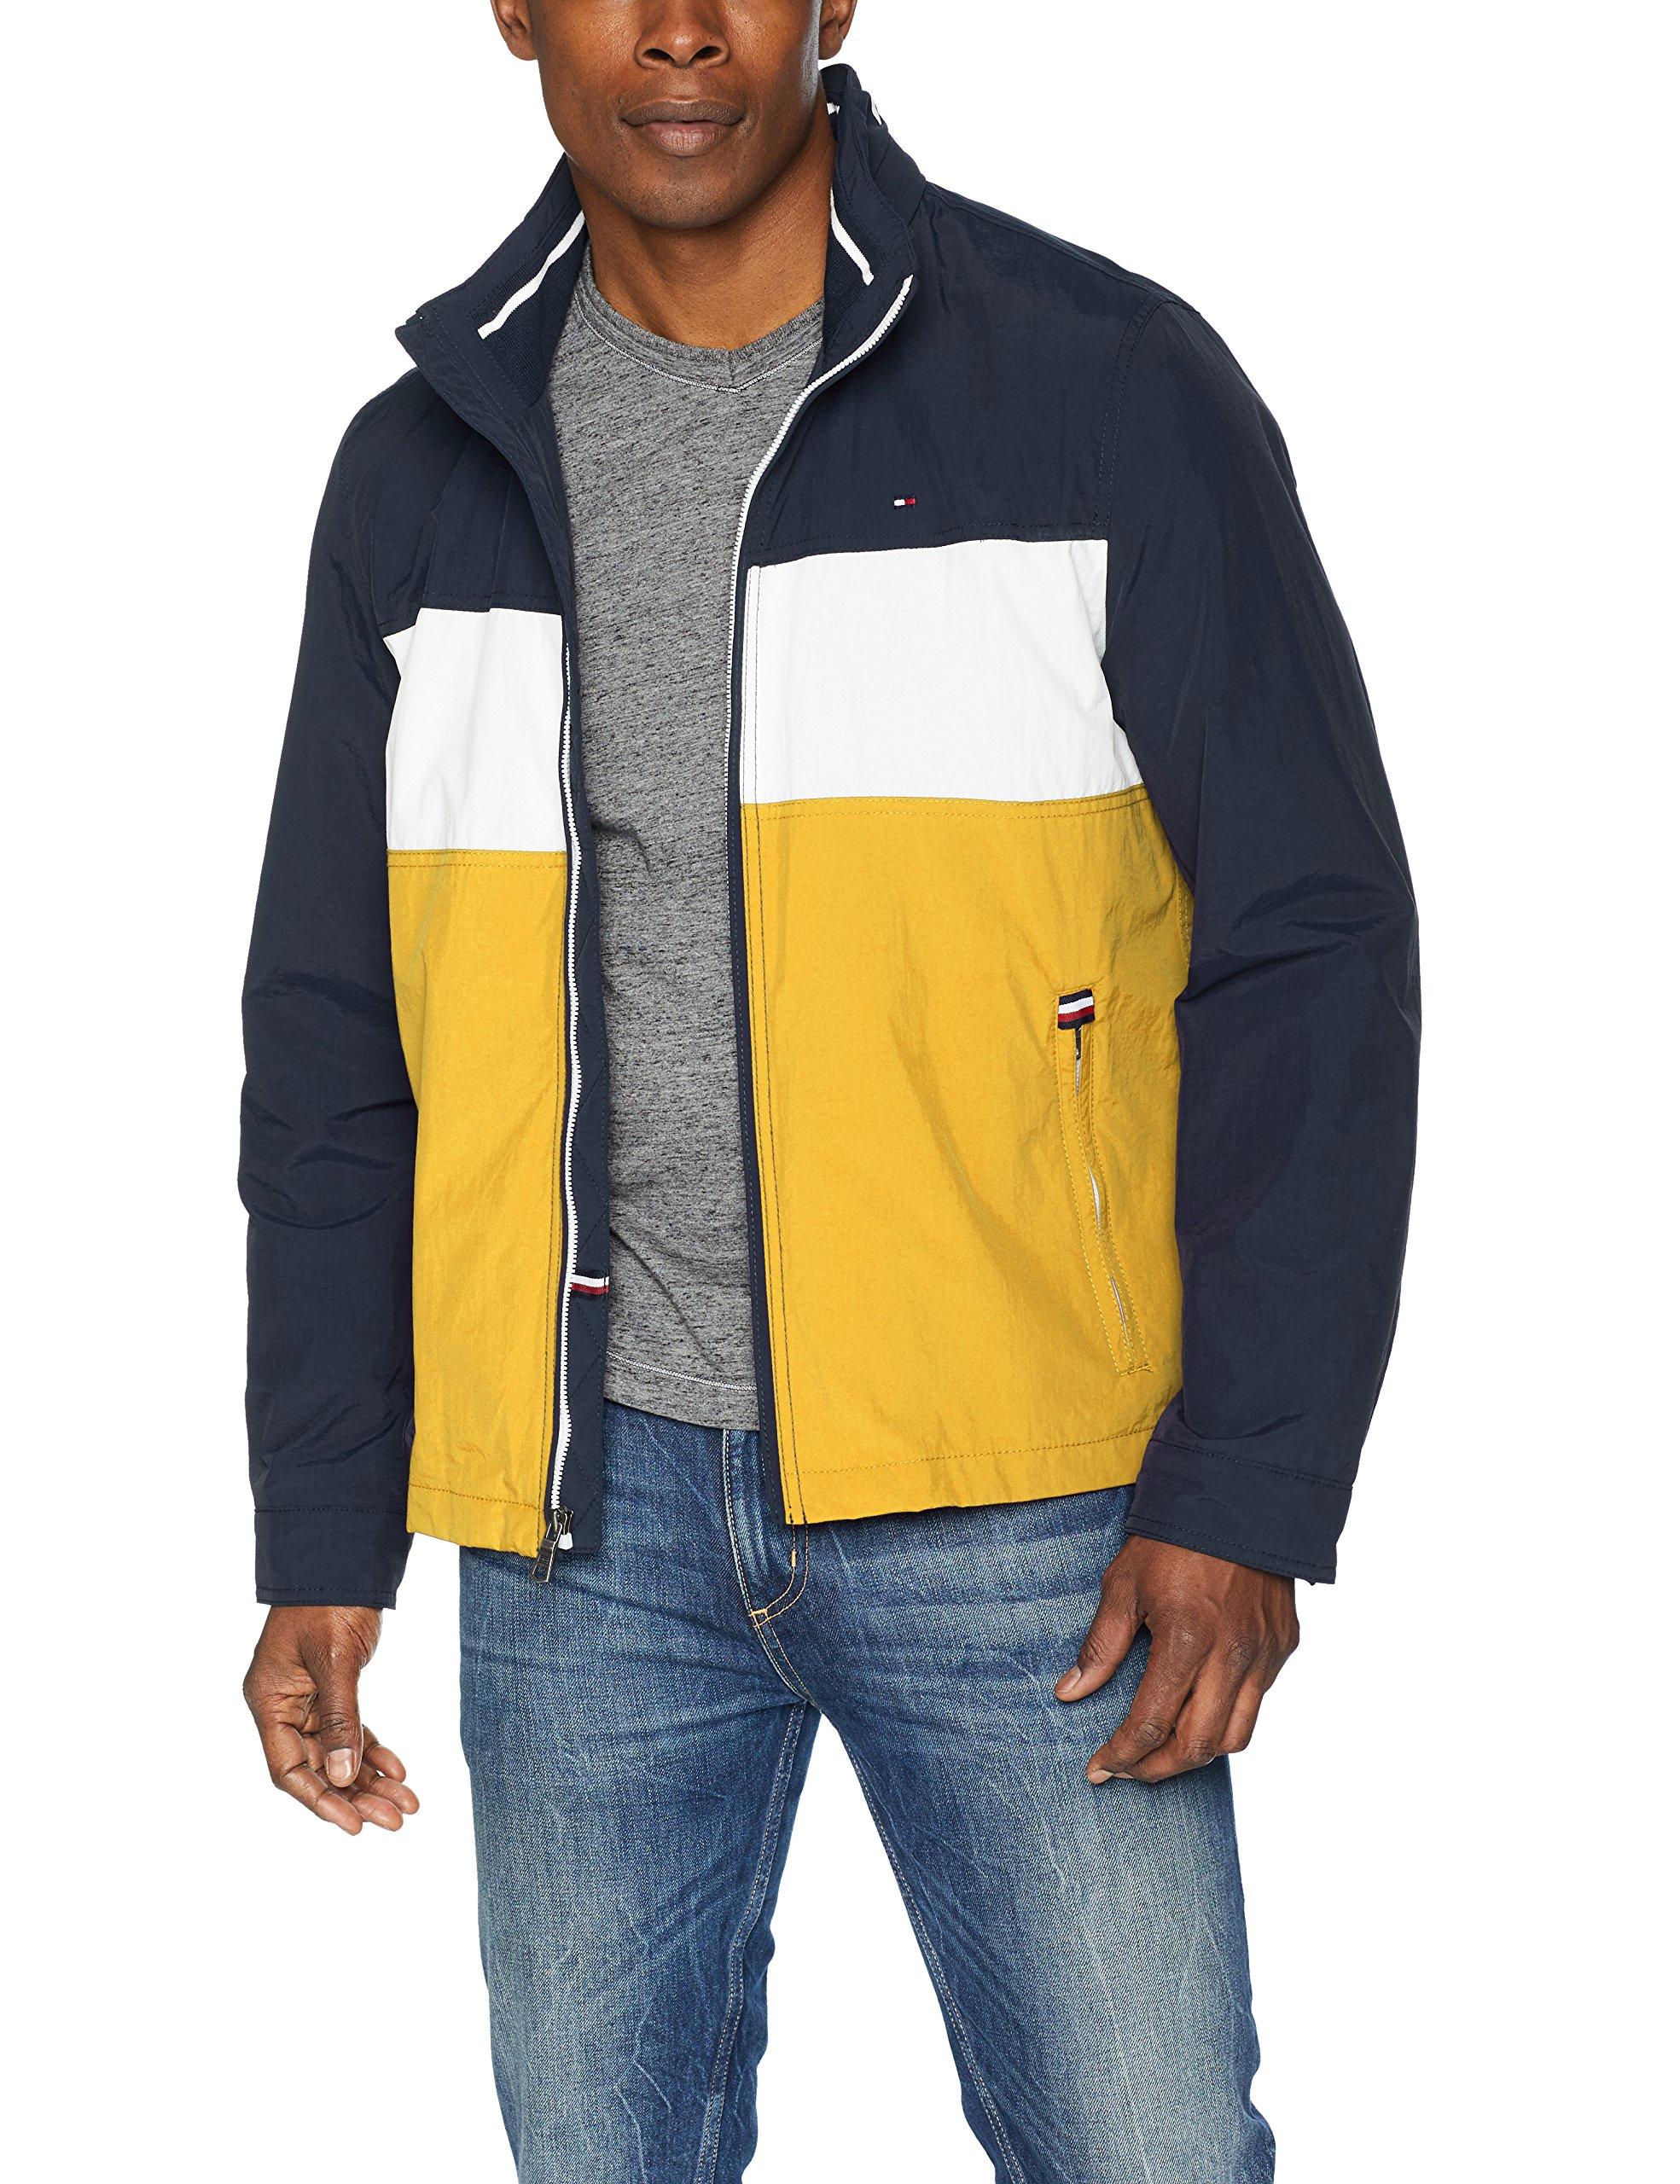 2d6a85d974a325 Galleon - Tommy Hilfiger Men s Stand Collar Lightweight Yachting Jacket